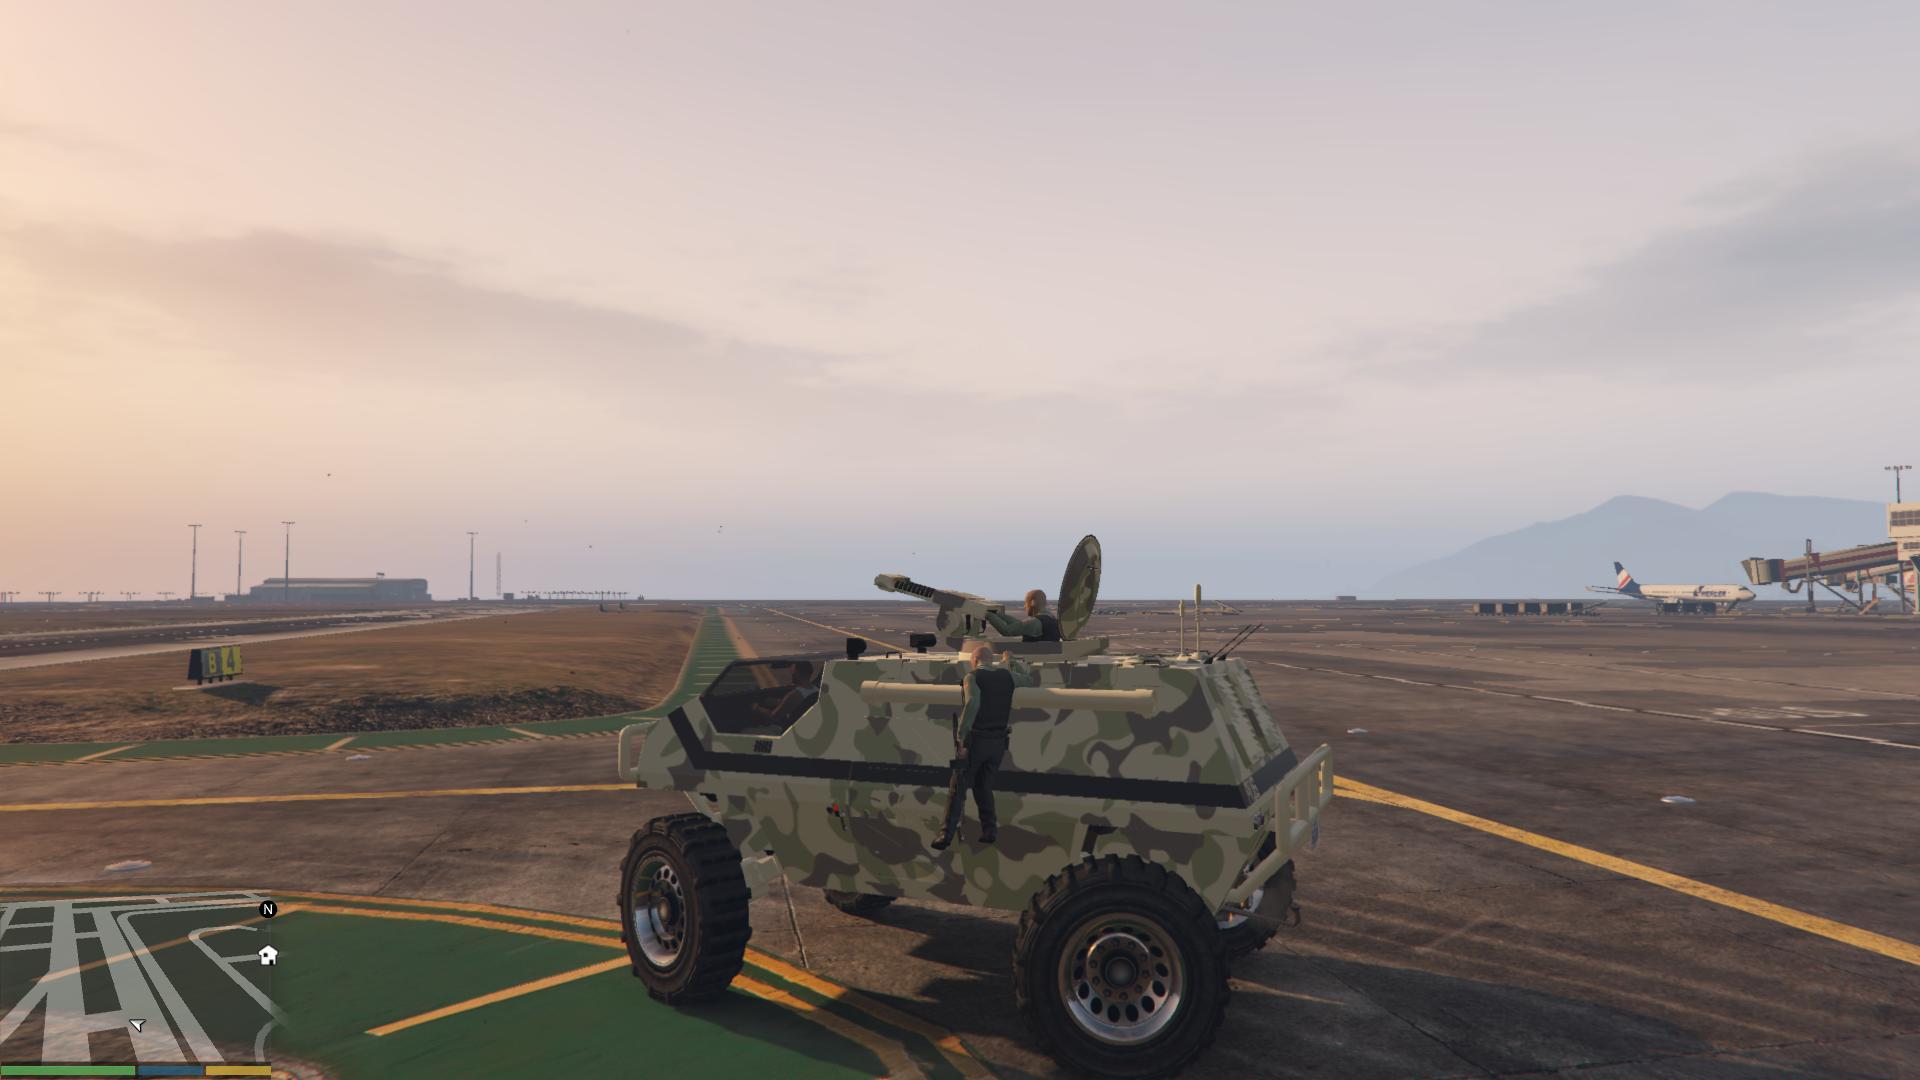 Скачать Rare Cars For GTA 5 [Add-On / (OIV)] от elcreador